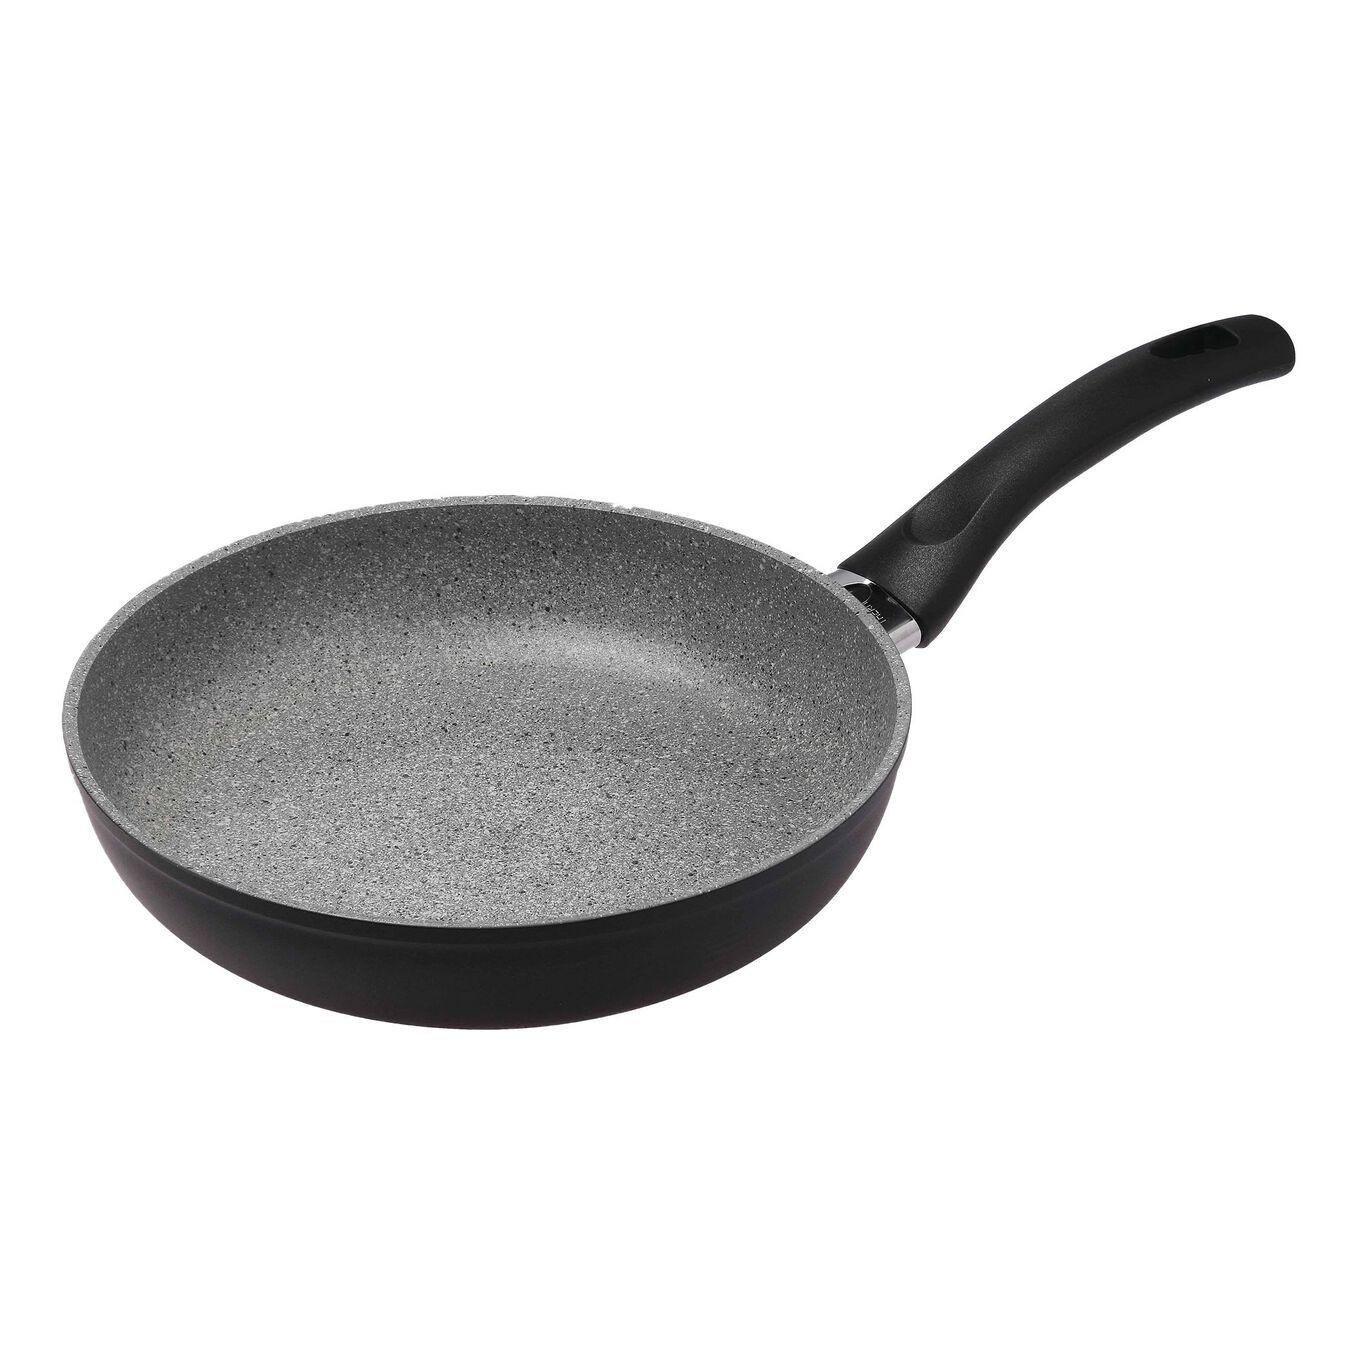 Aluminium round 32cm/12.5in frypan pan, grey,,large 1